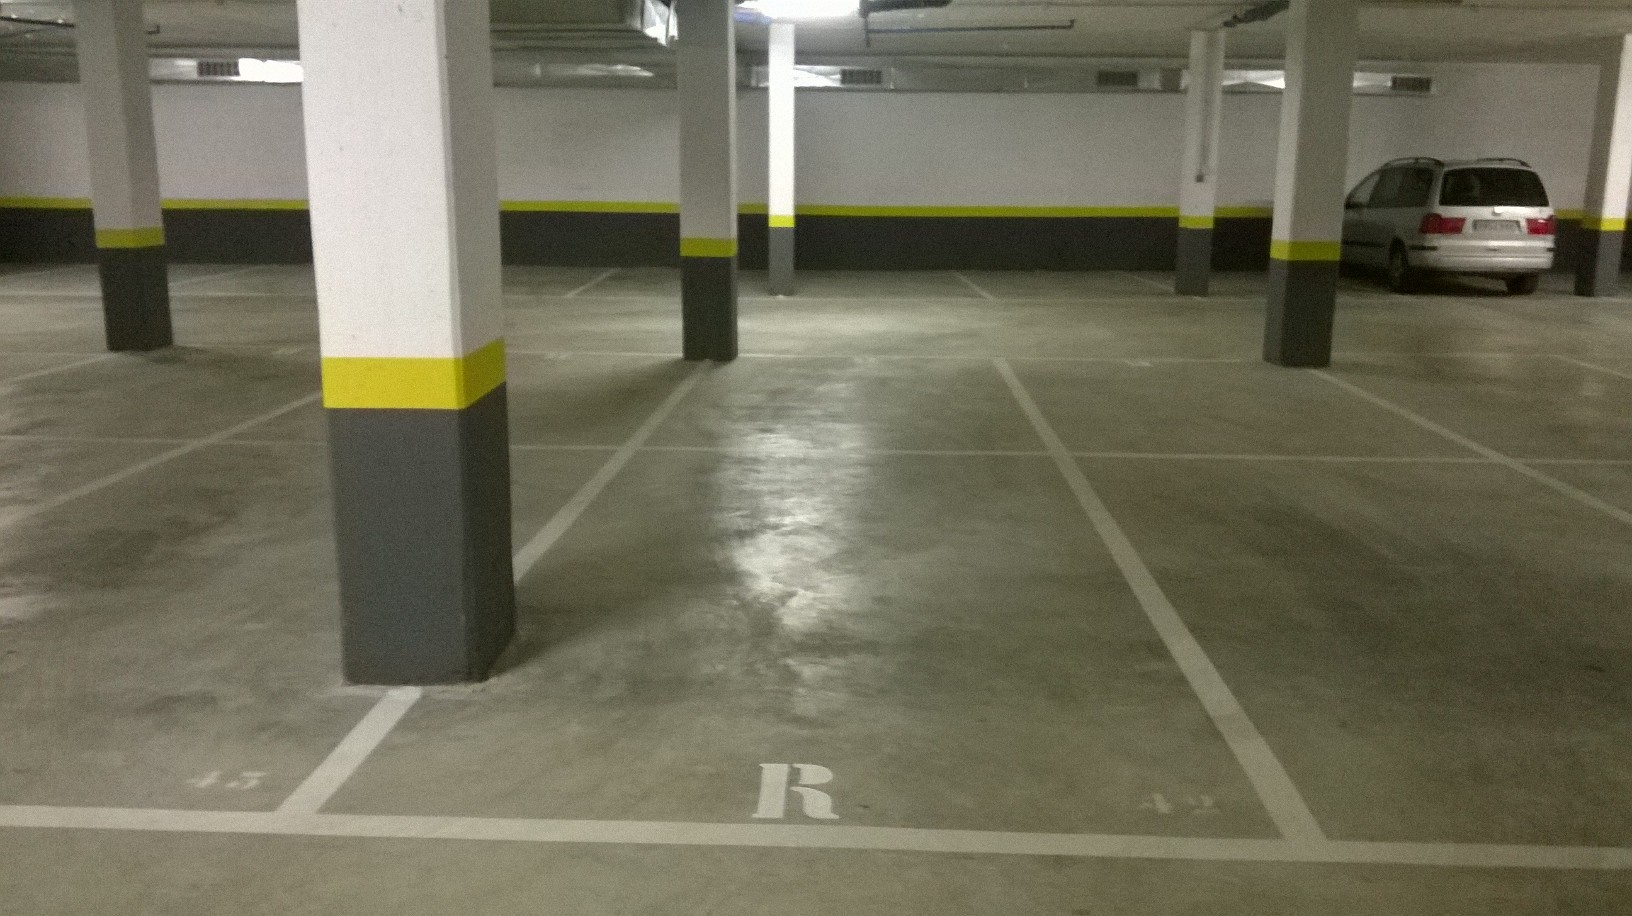 invertir en lotes de 5 plazas de garaje en balmes el putxet